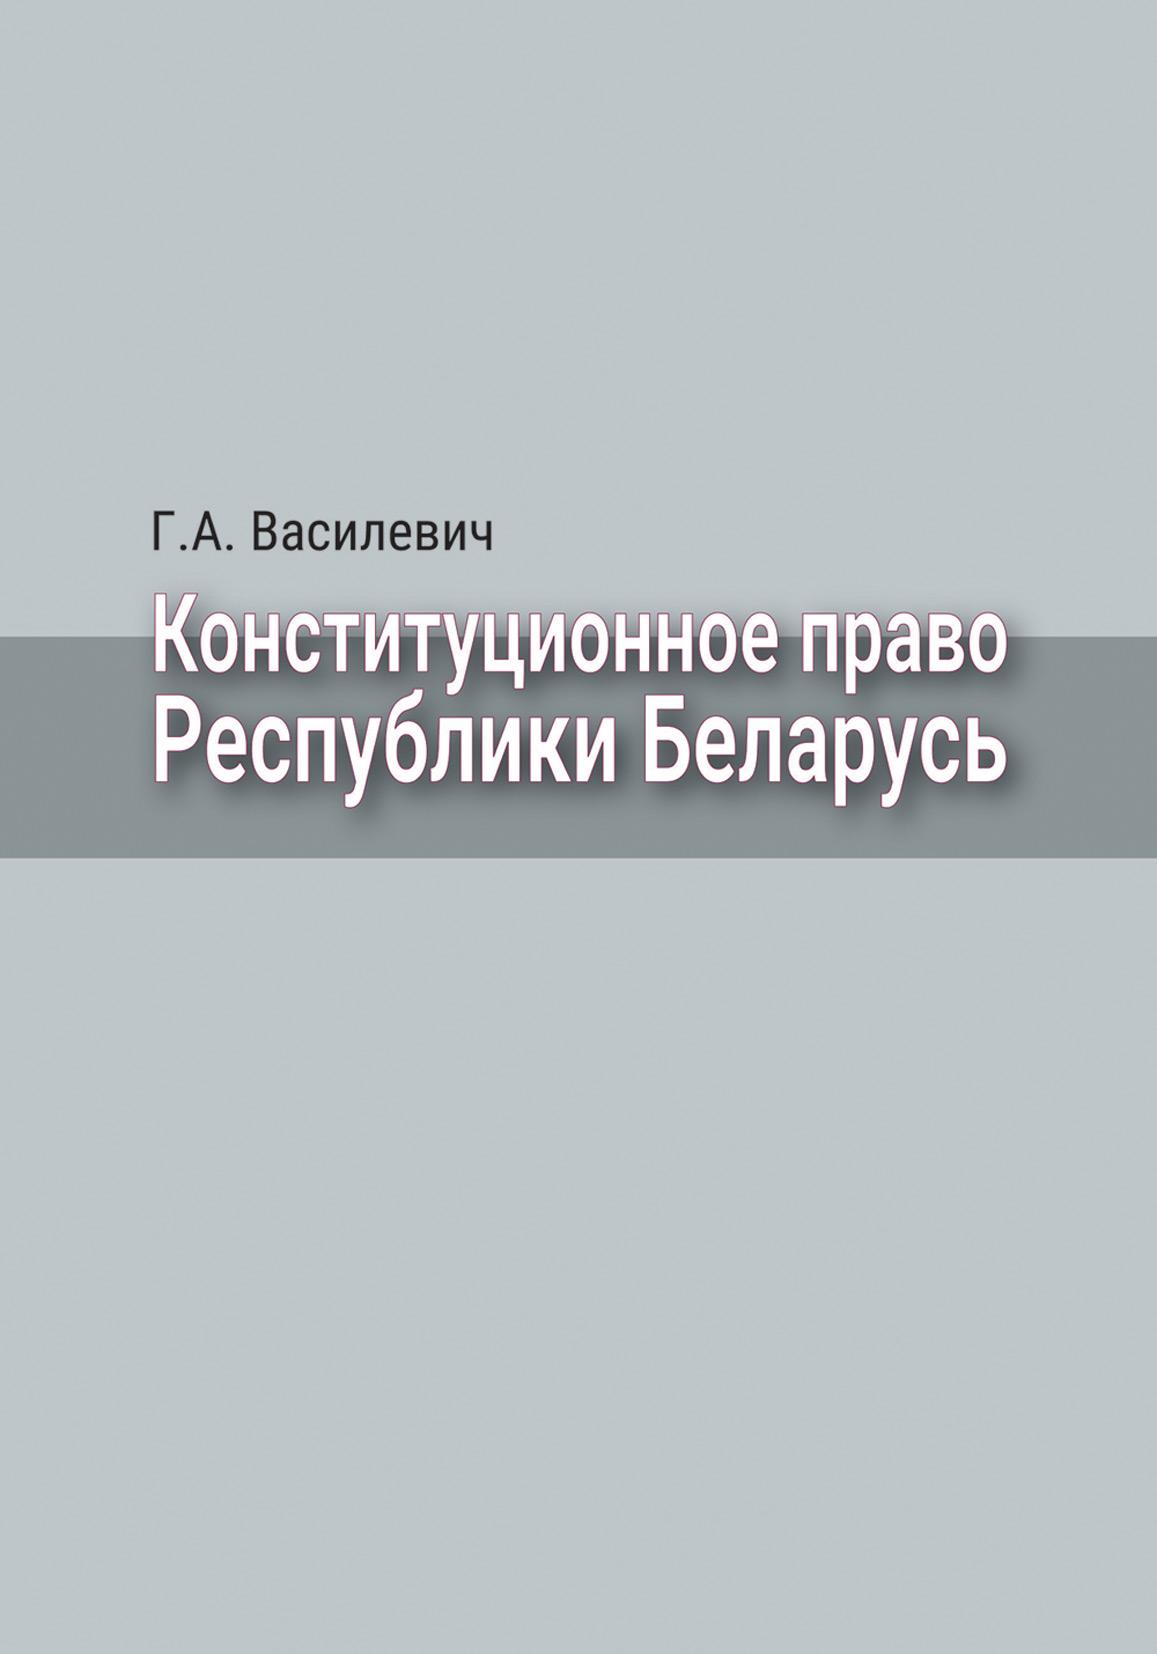 Г. А. Василевич Конституционное право Республики Беларусь цена